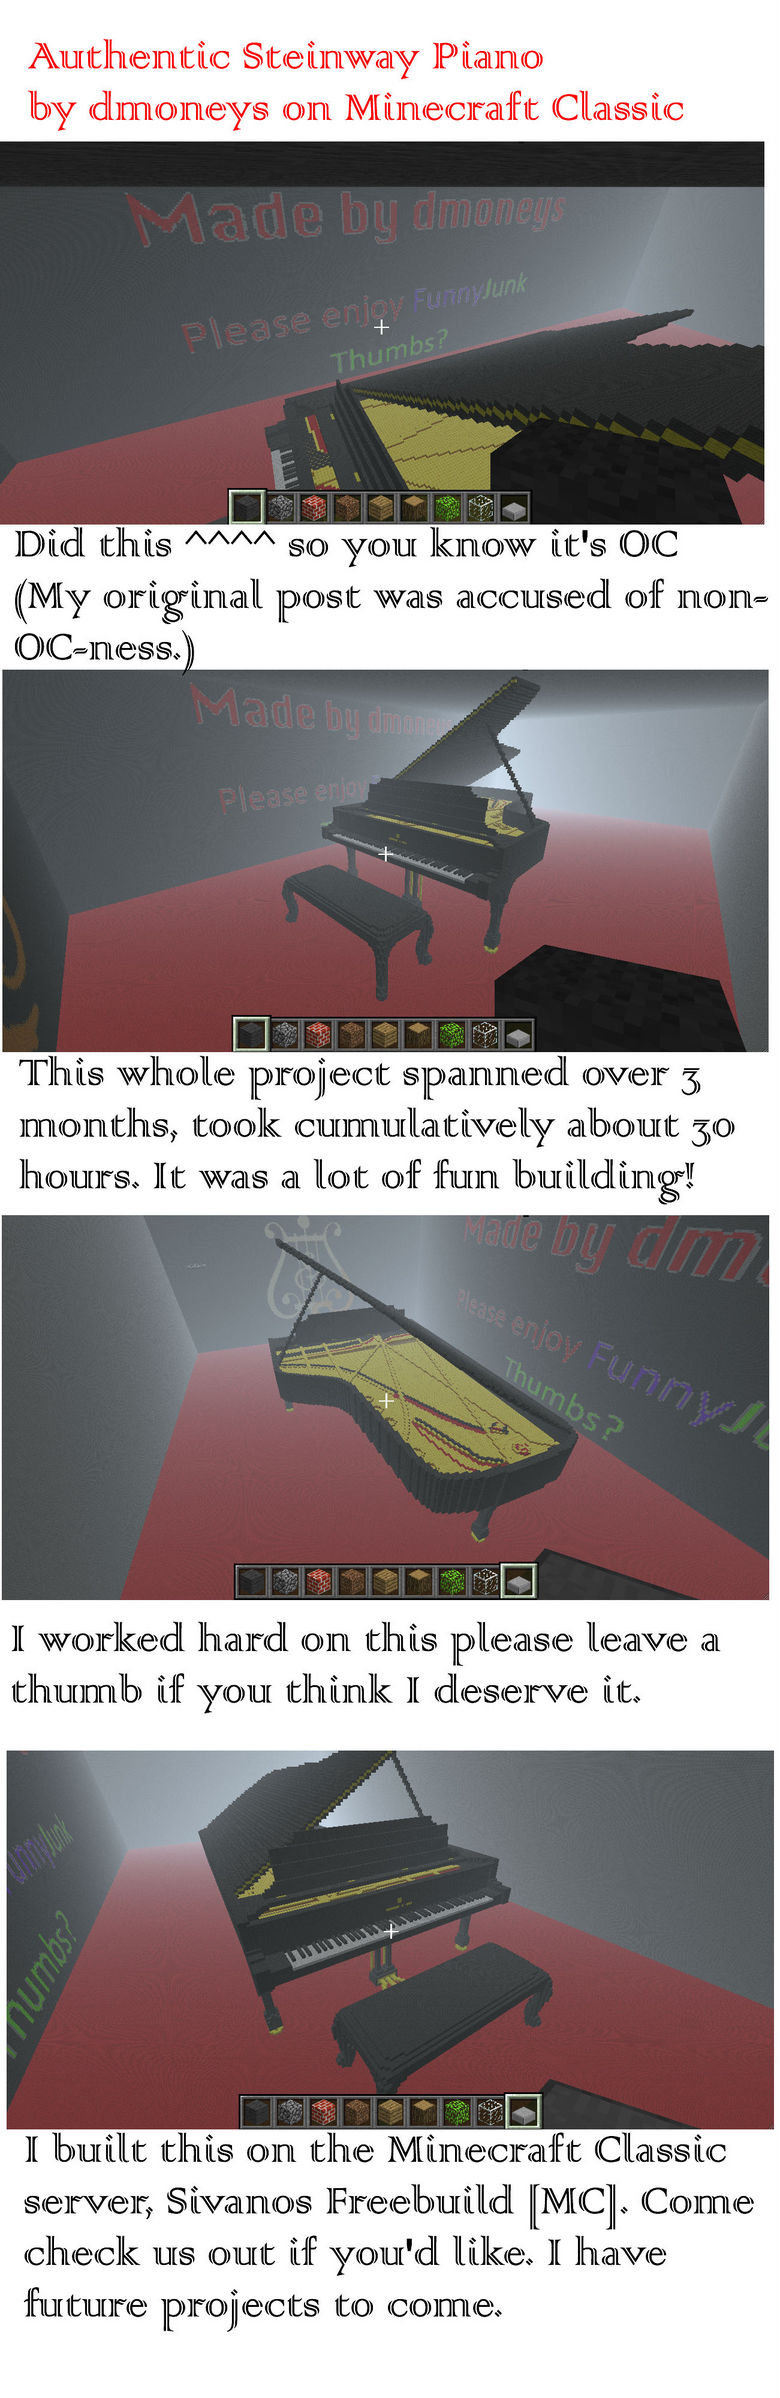 http://img.niceminecraft.net/Funny/Minecraft-Steinway-Piano.jpg